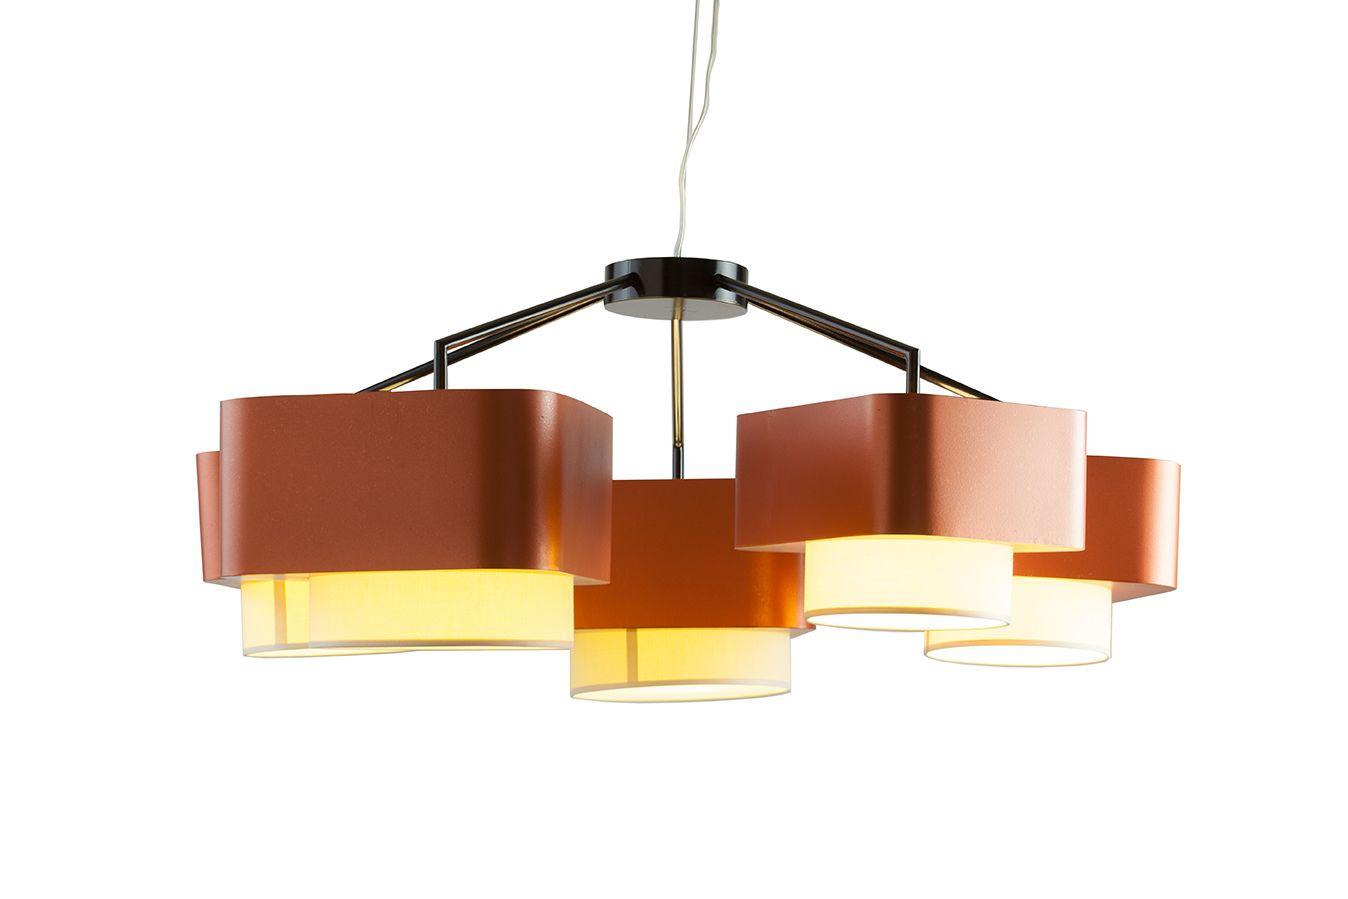 Carousel suspension lamp Design by Cláudia Melo for Mambo Unlimited Ideas  www.mambo-unlimitedideas.com